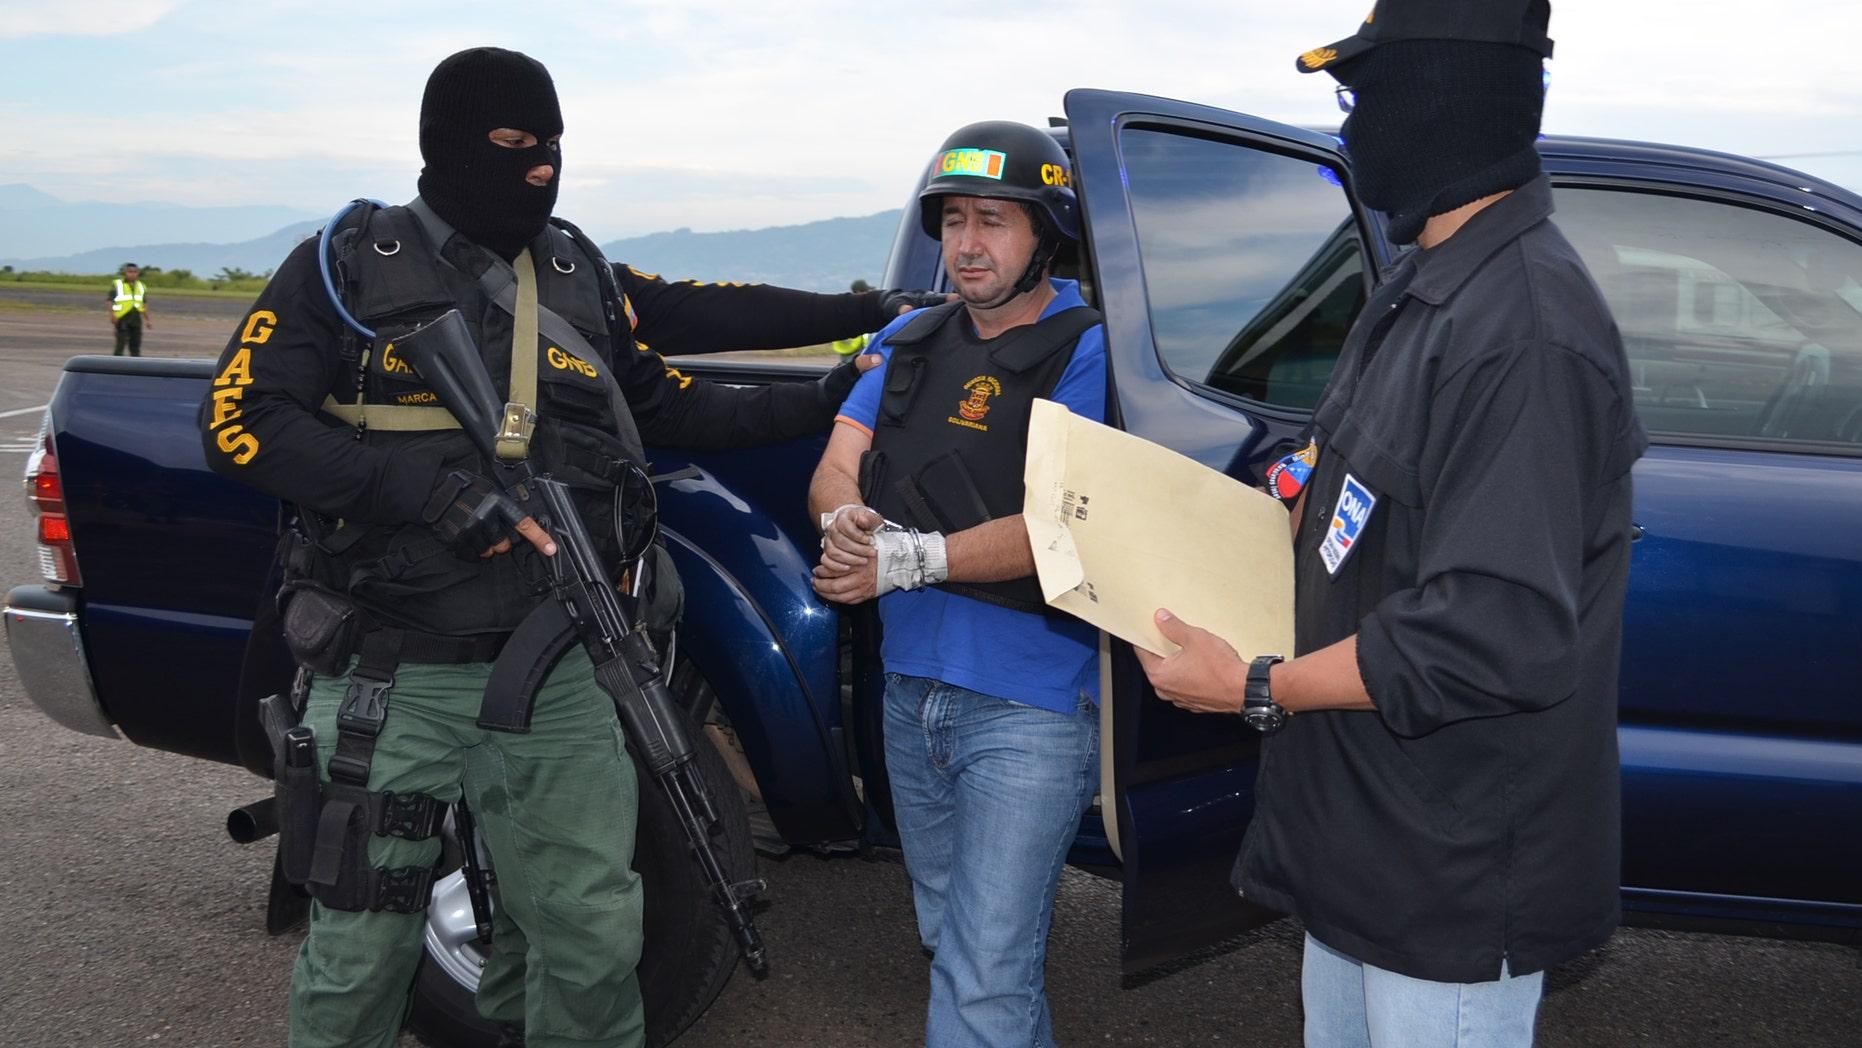 Sept. 19, 2012: Venezuela's judicial police officers escort alleged Colombian drug trafficker Daniel Barrera, center, at the Regional Command No. 1 National Guard base in San Cristobal, Tachira state, Venezuela.